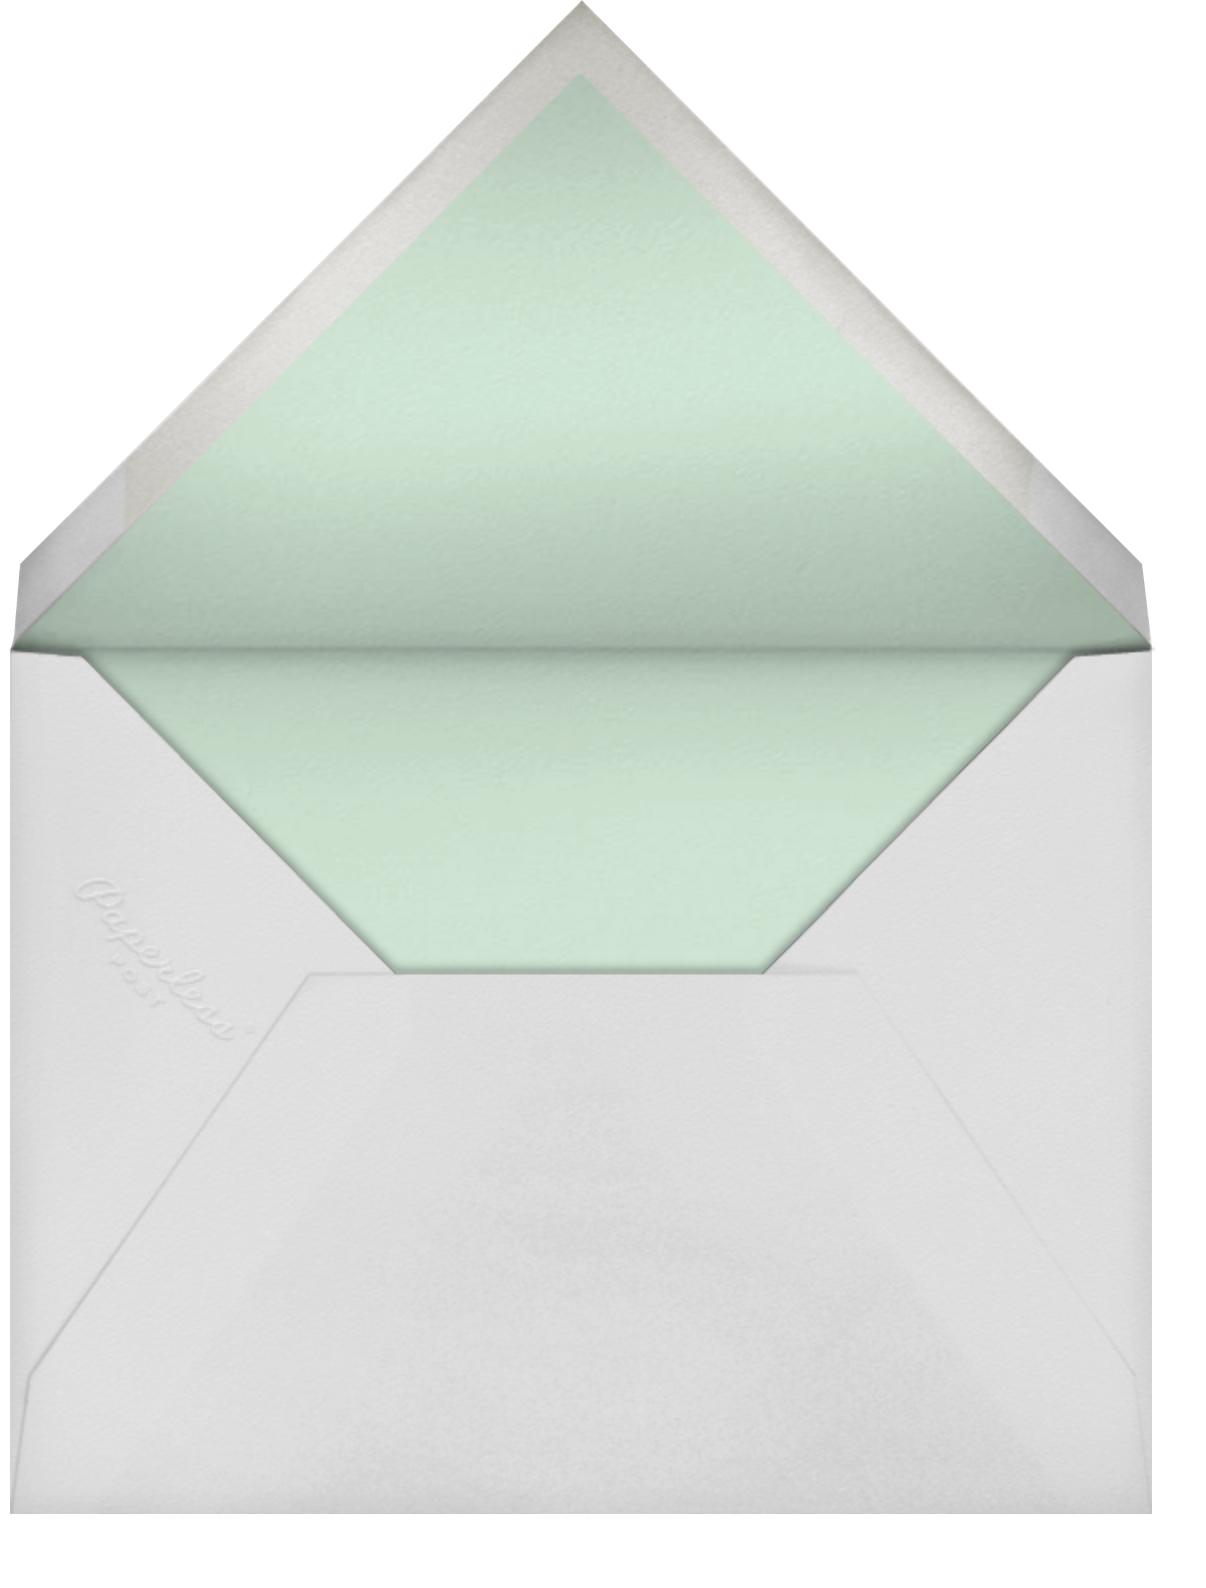 Sybilla - Mint - Paperless Post - Baby shower - envelope back